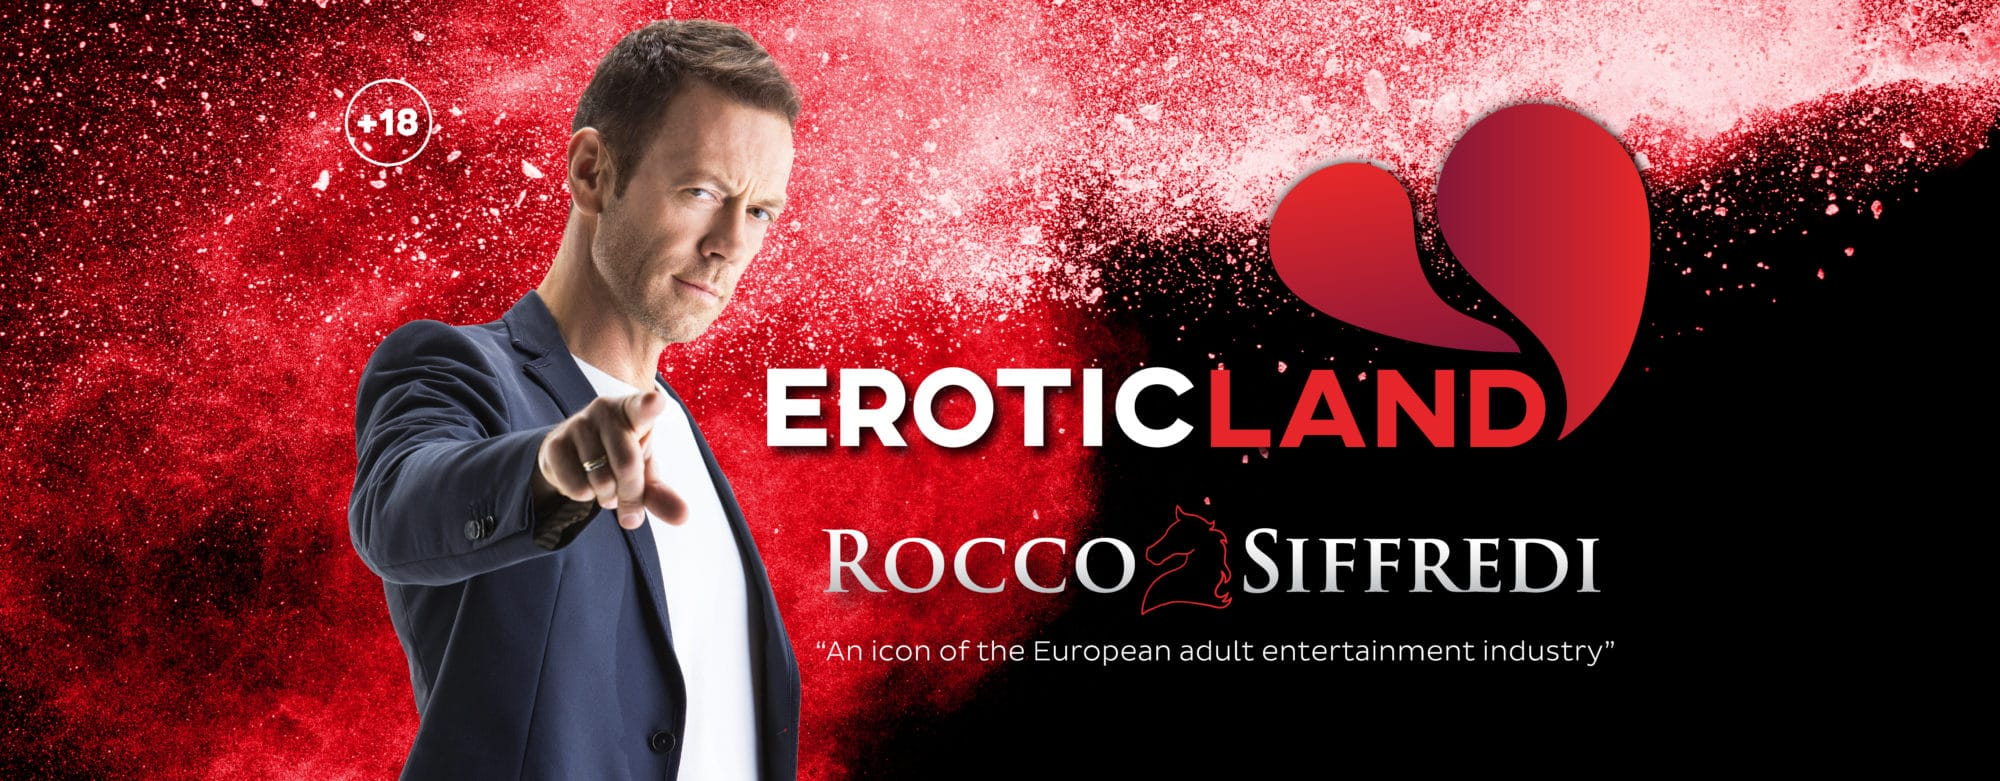 Prihaja Eroticland!